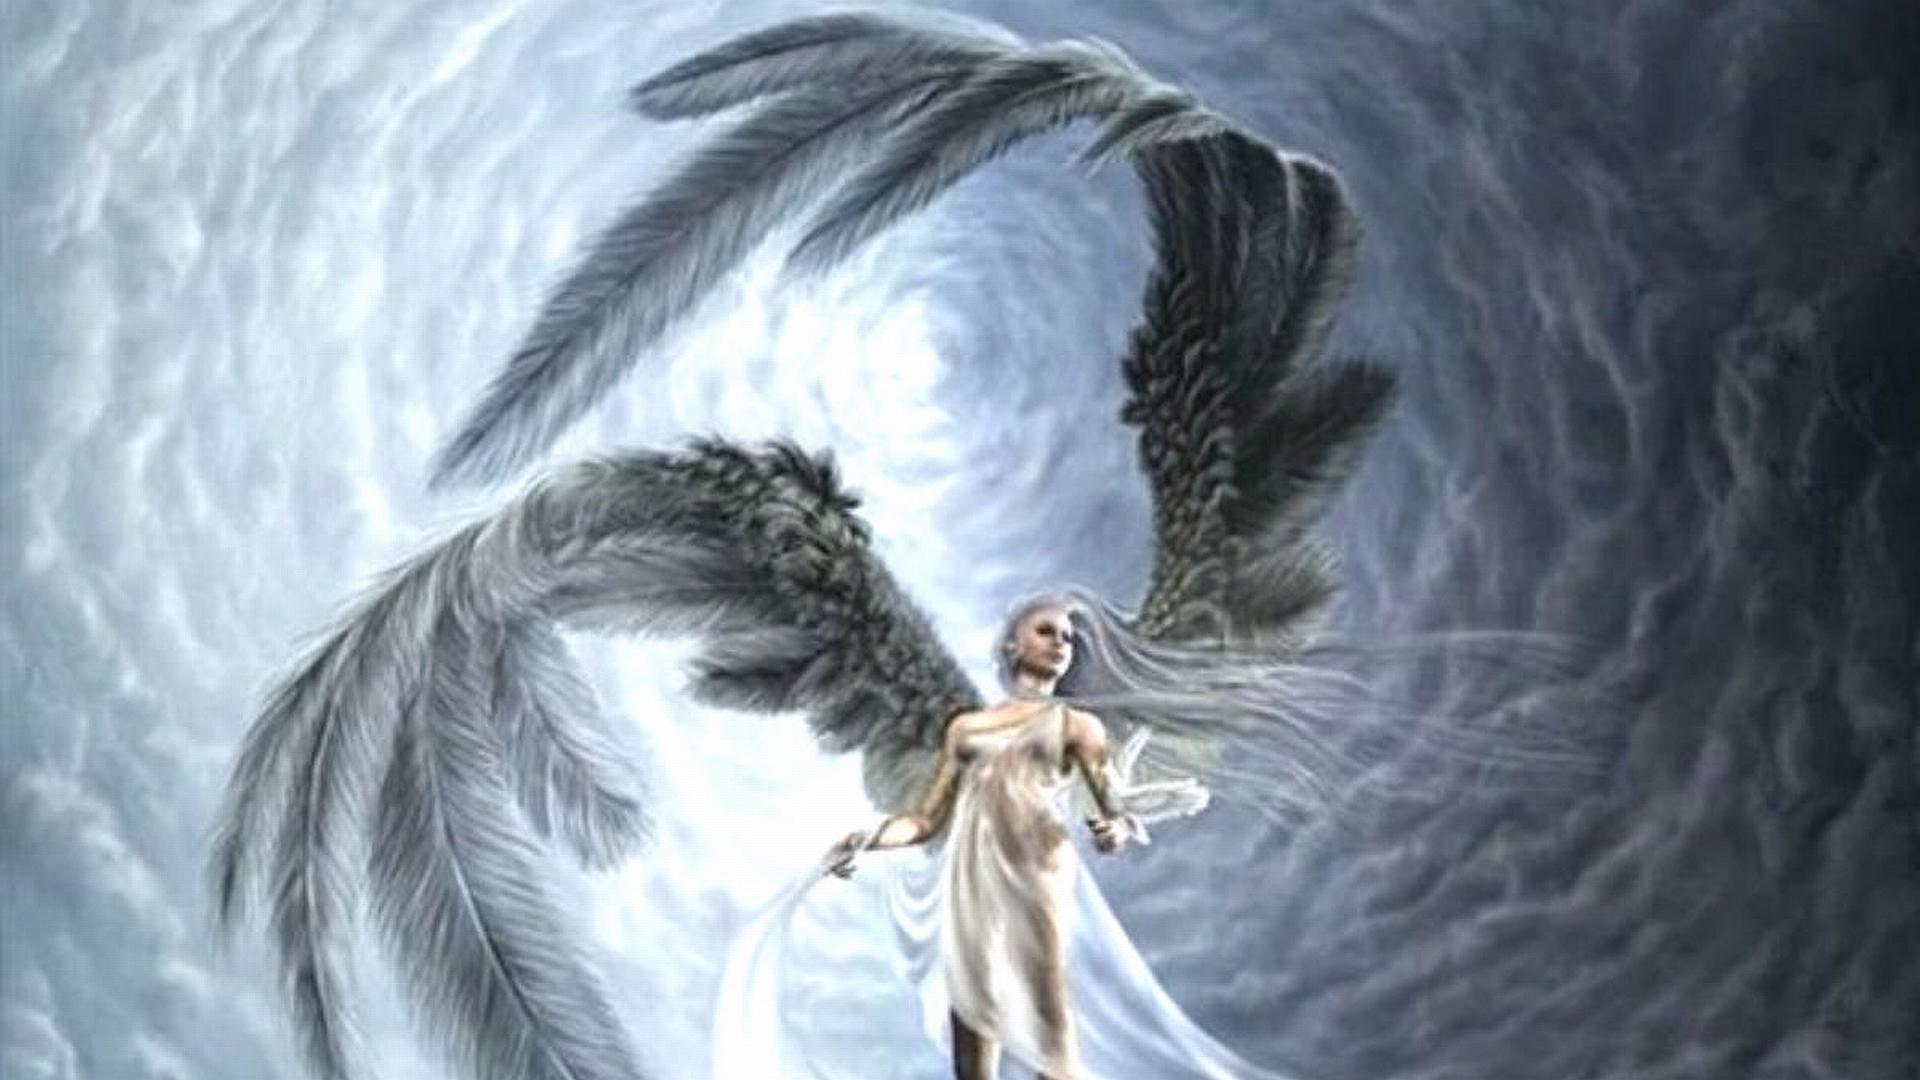 Free Angel 1504546 Hd Wallpaper Backgrounds Download